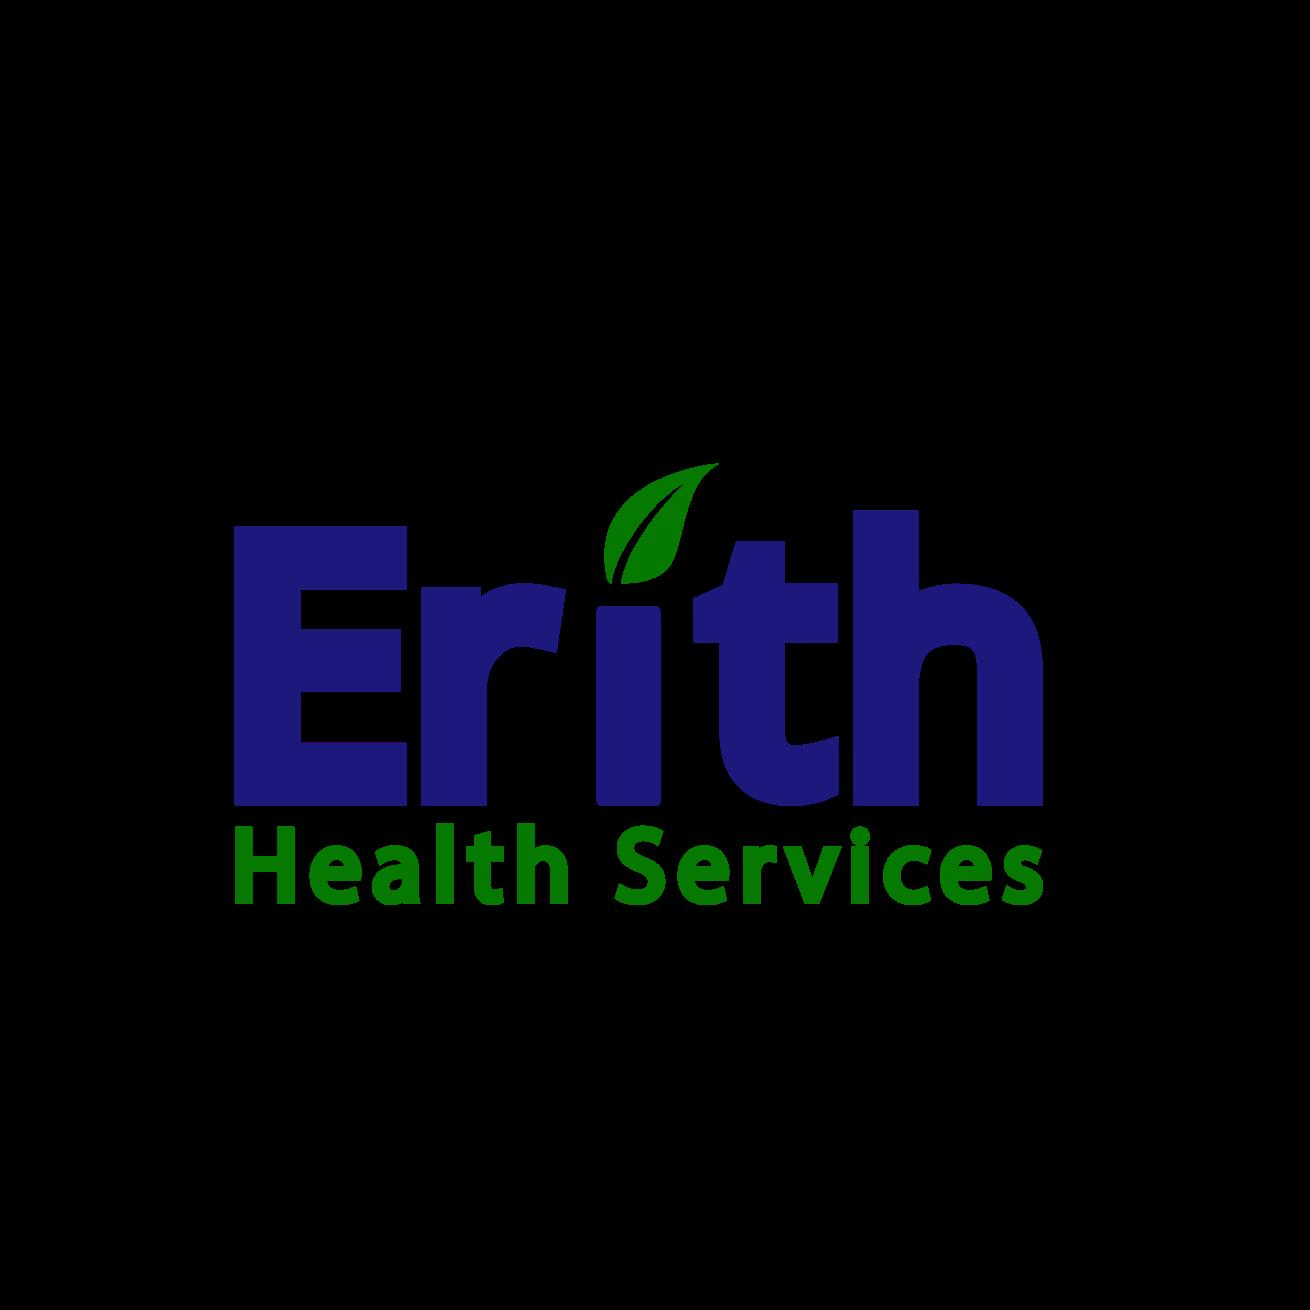 Erith Health Services